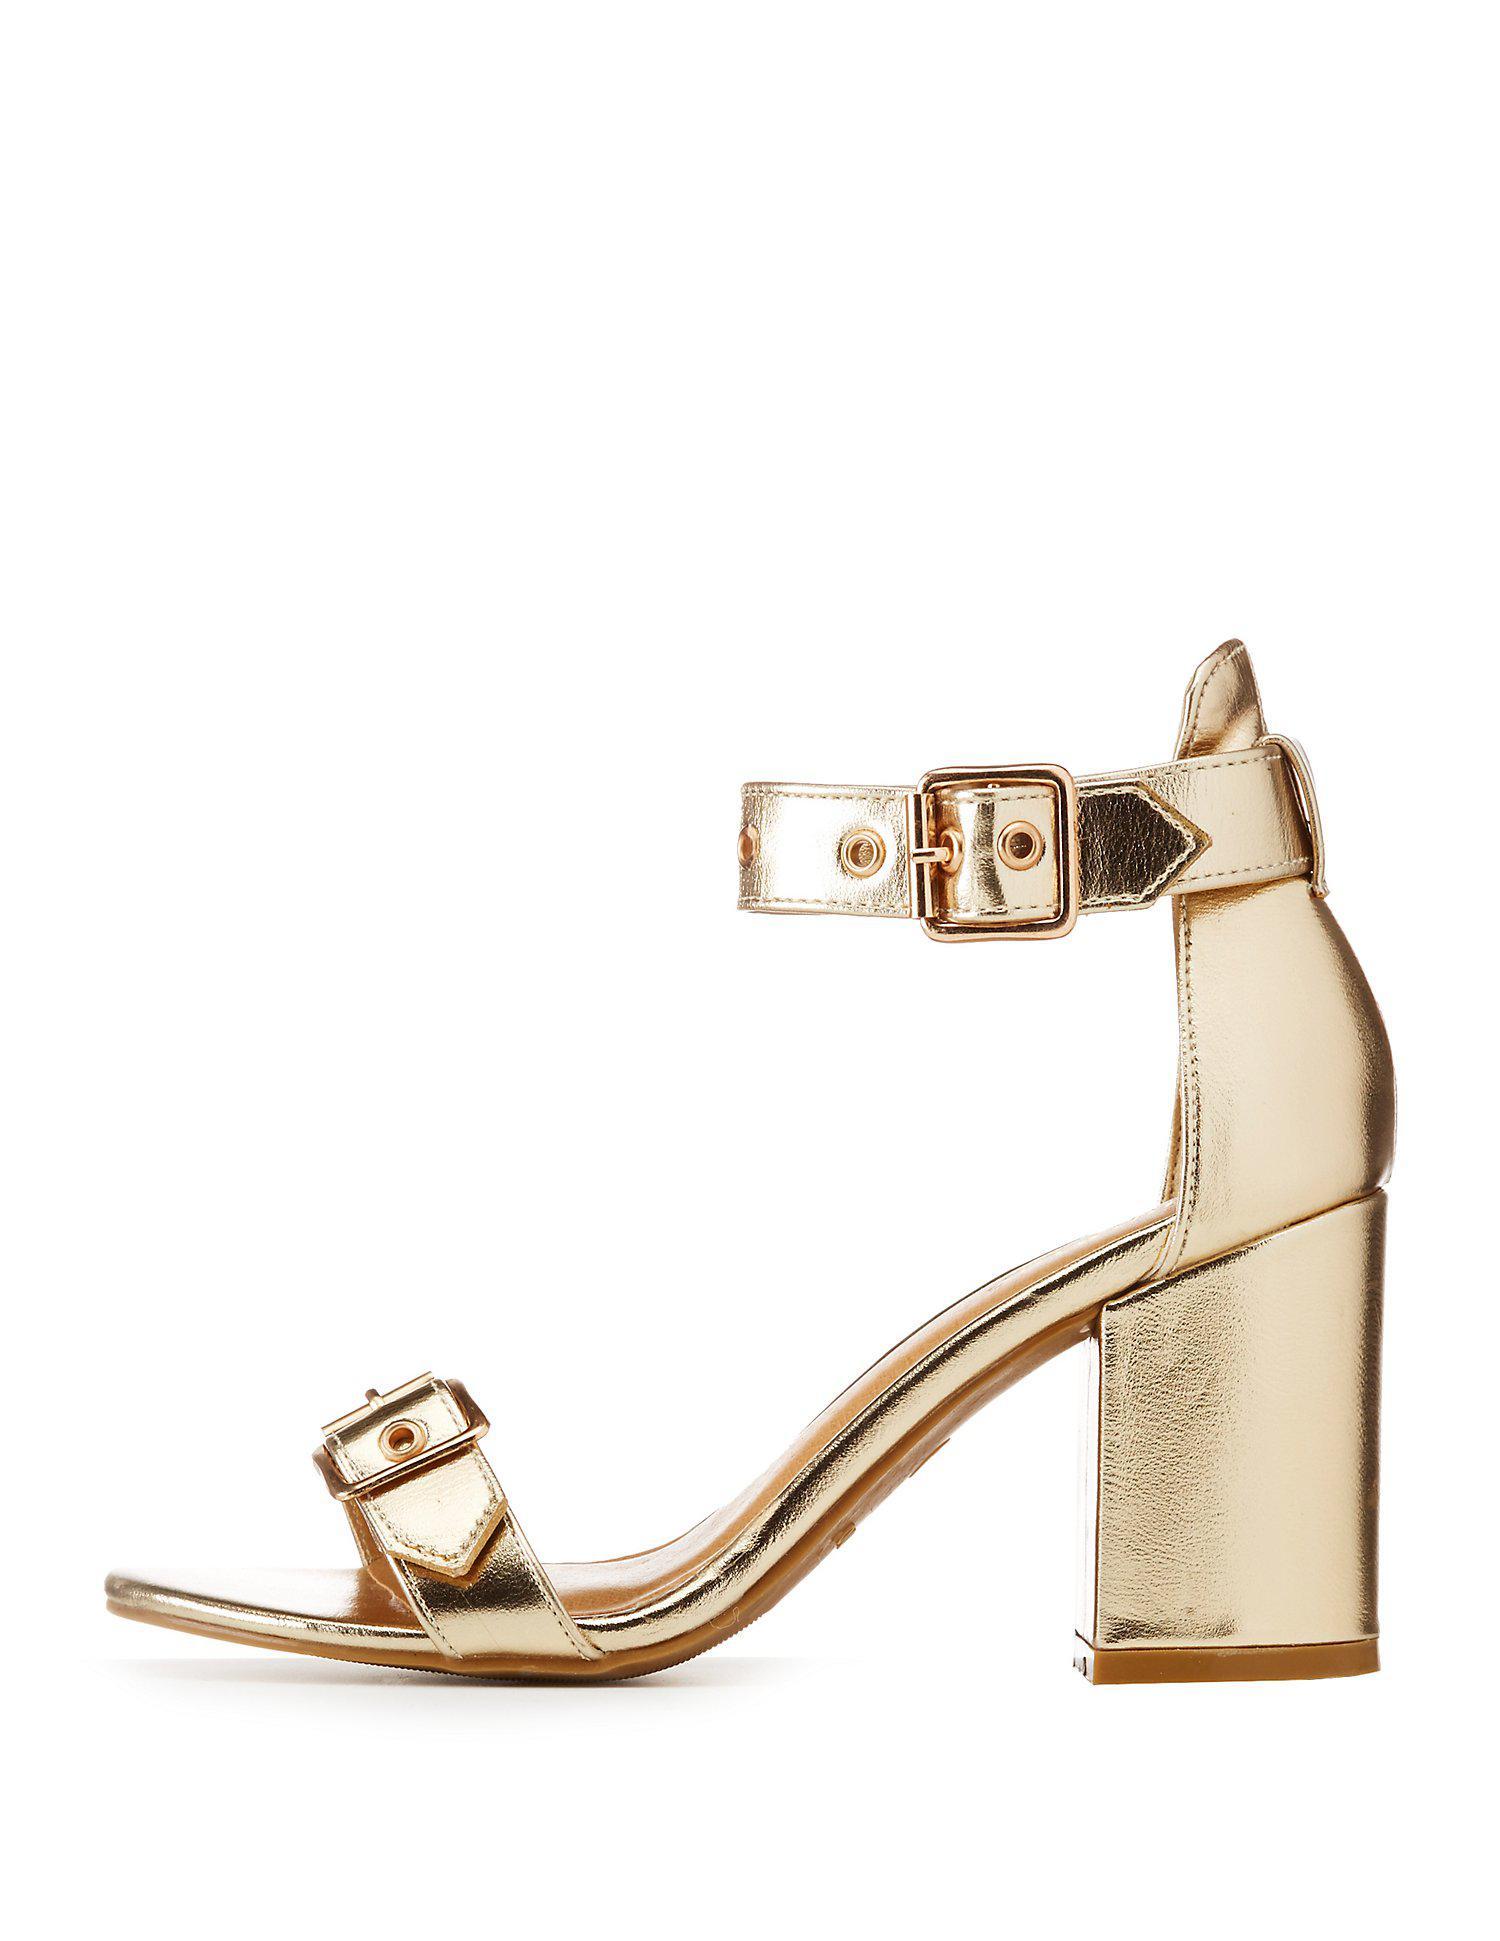 12ac4768da0d Lyst - Charlotte Russe Metallic Buckle Ankle Strap Sandals in Metallic